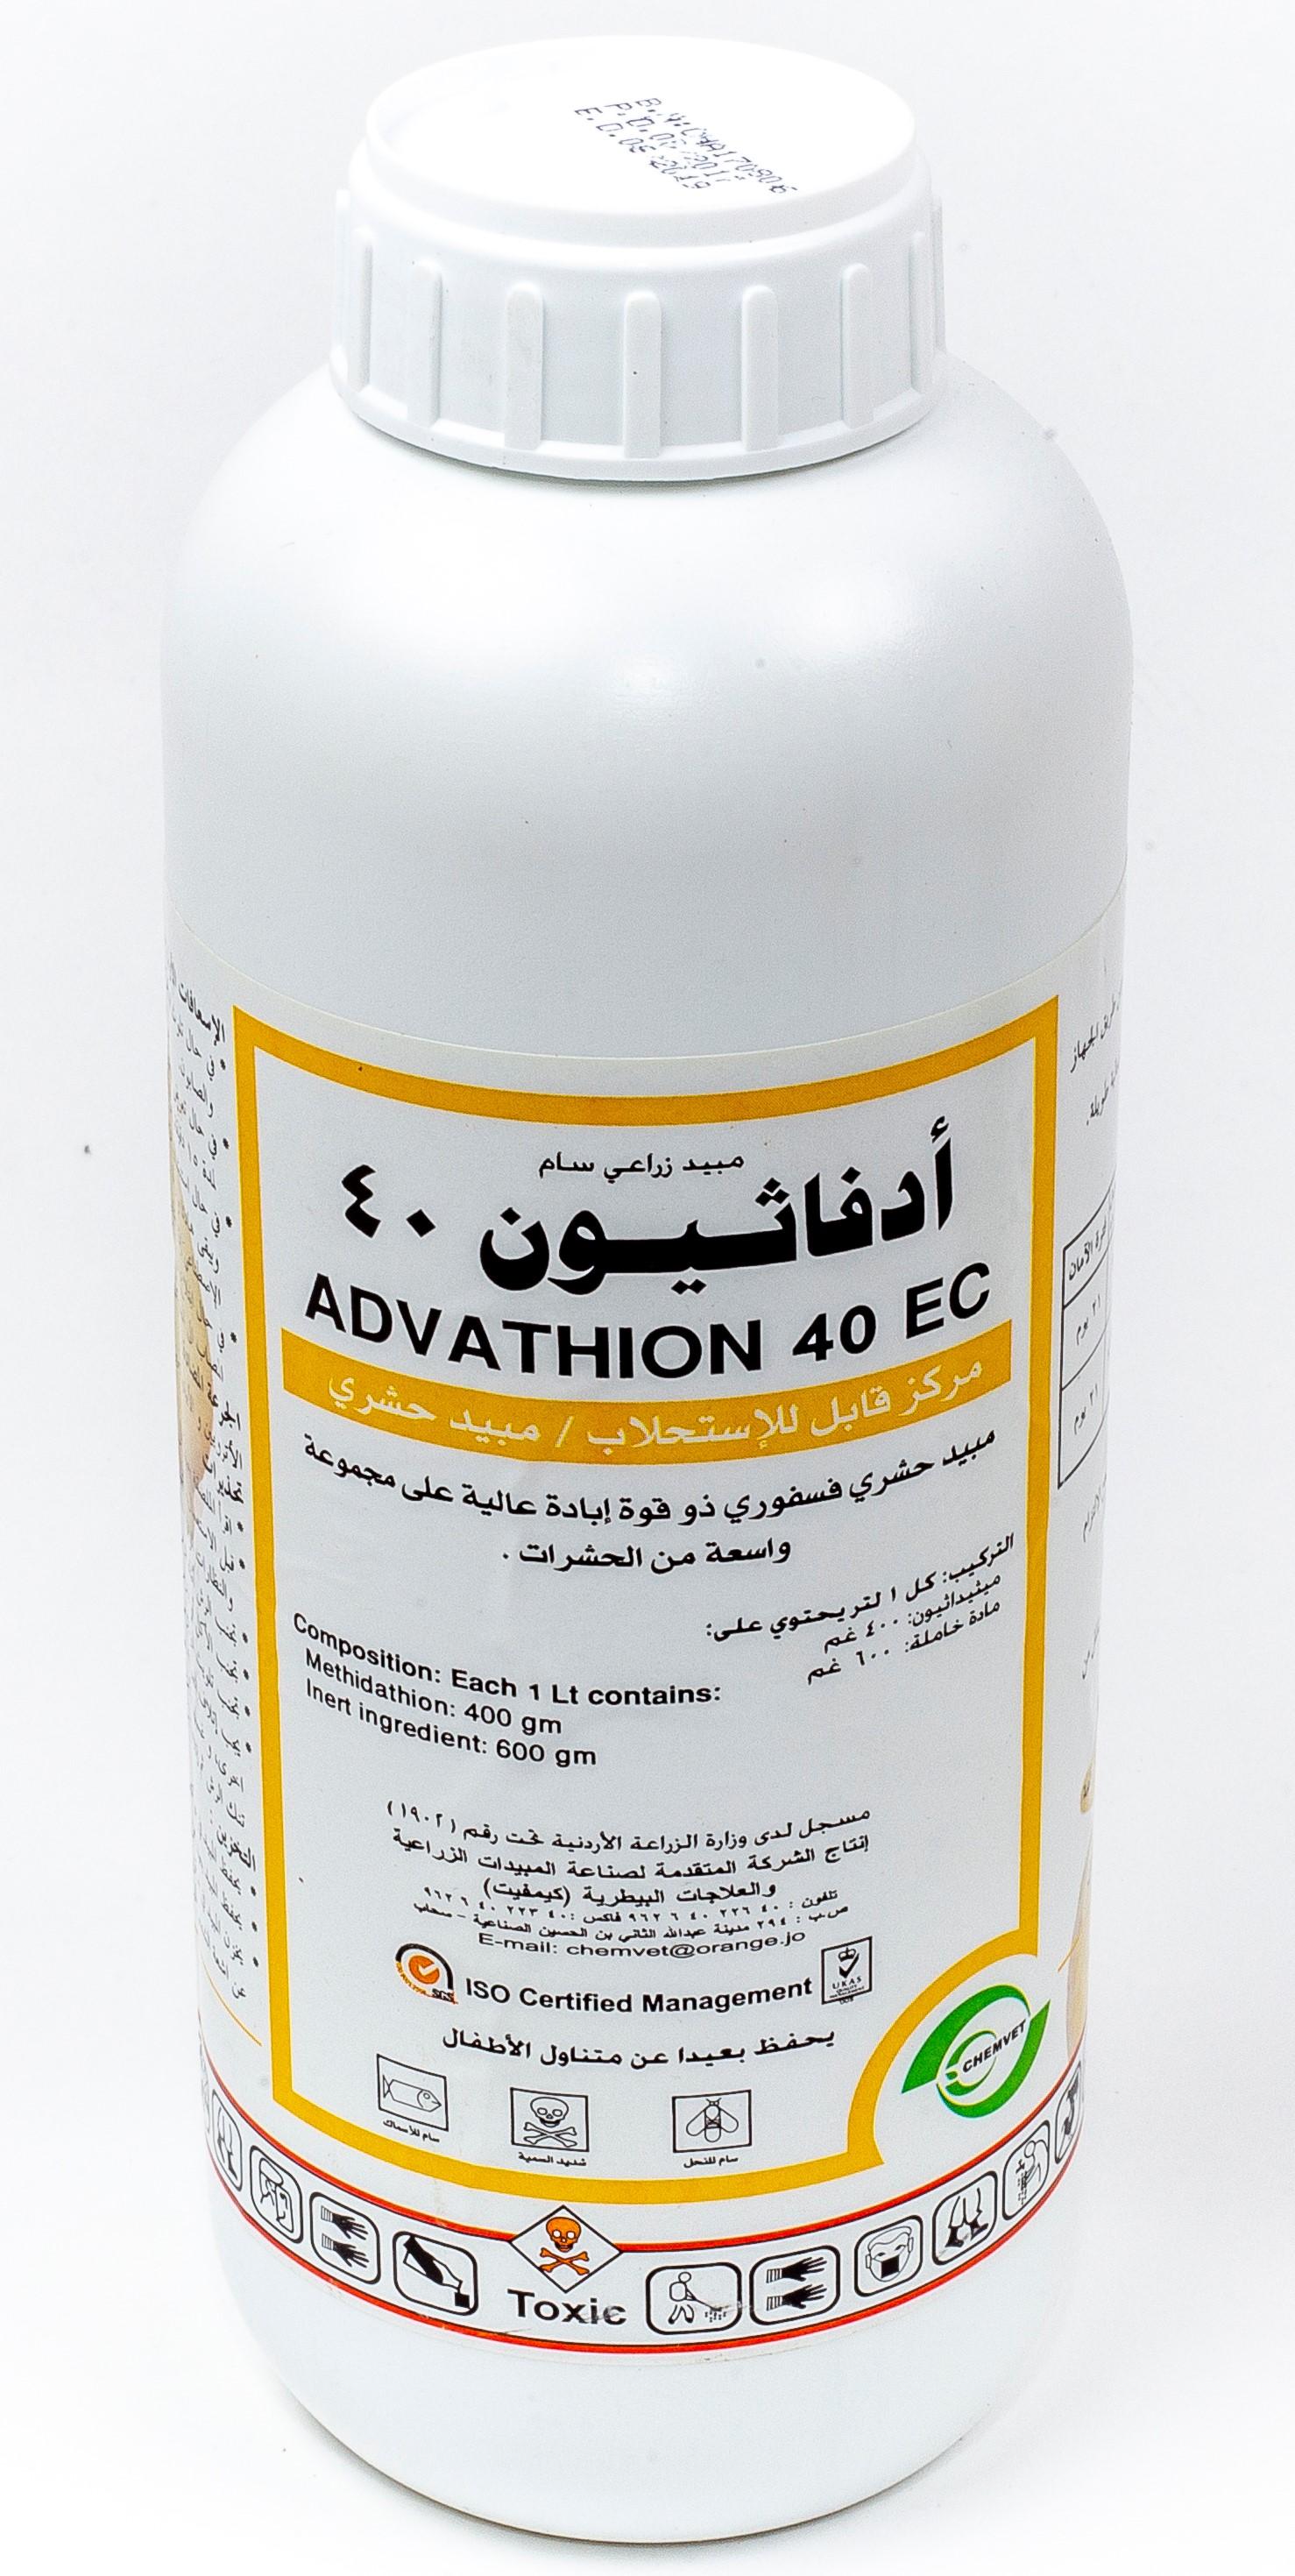 Advathion 40 EC